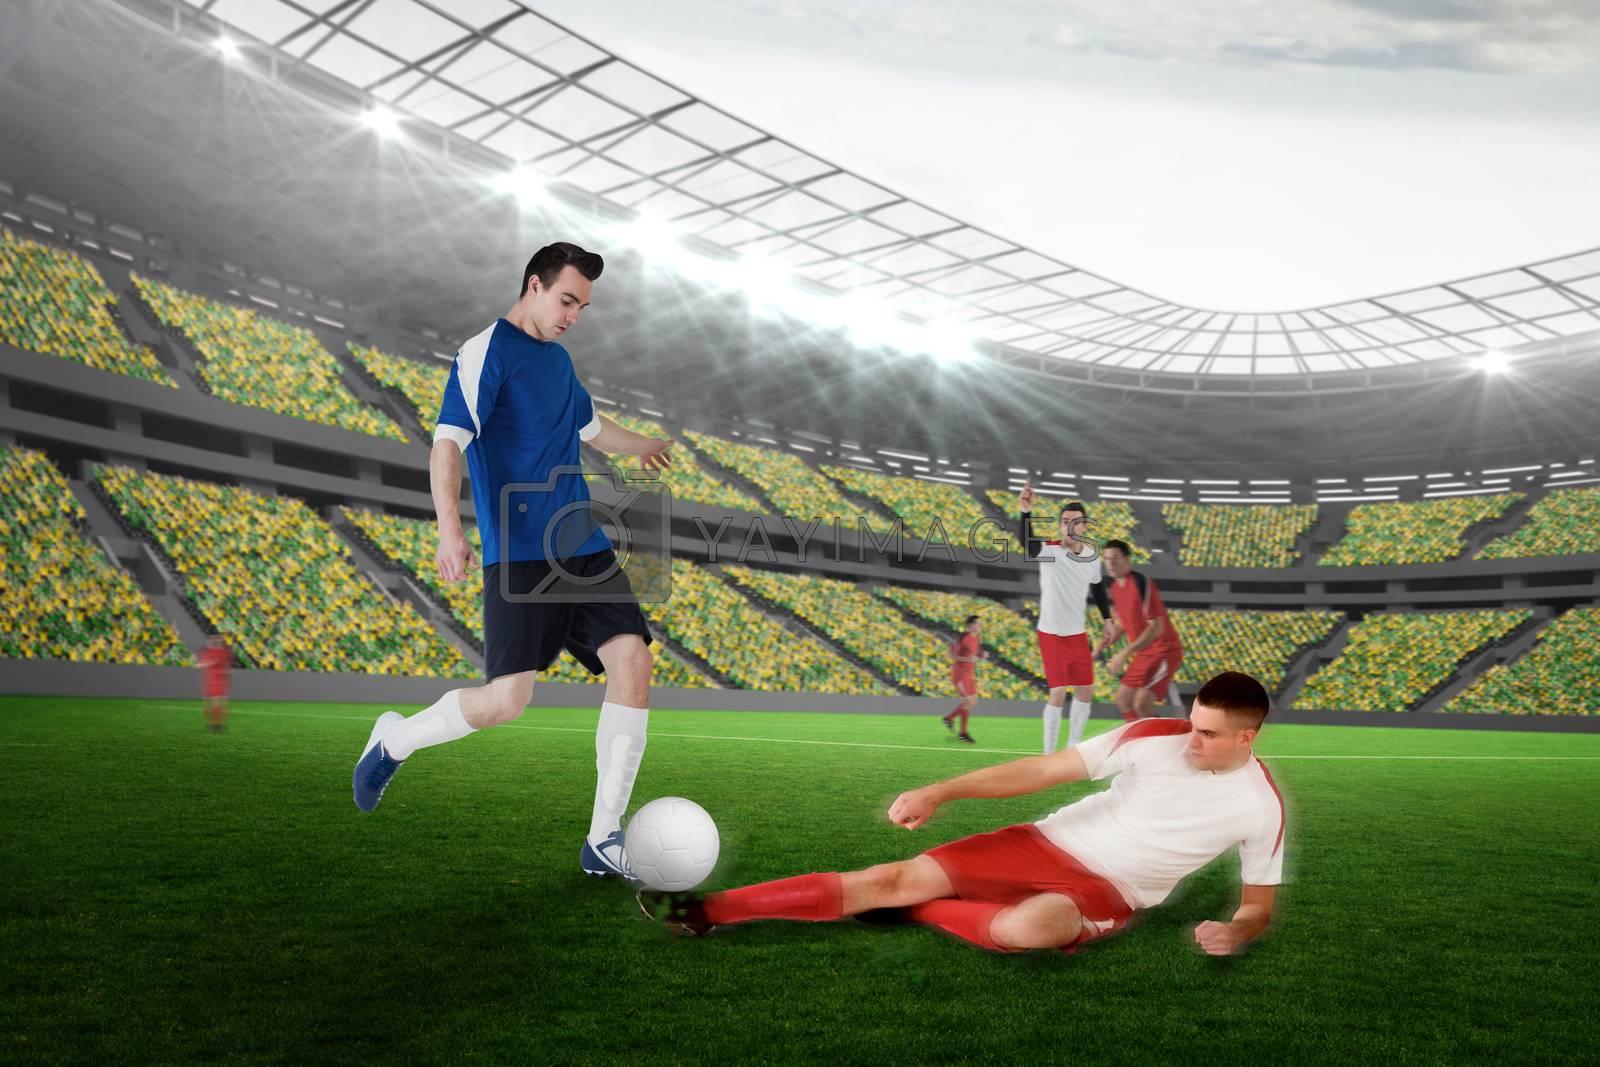 Football player in blue kicking by Wavebreakmedia